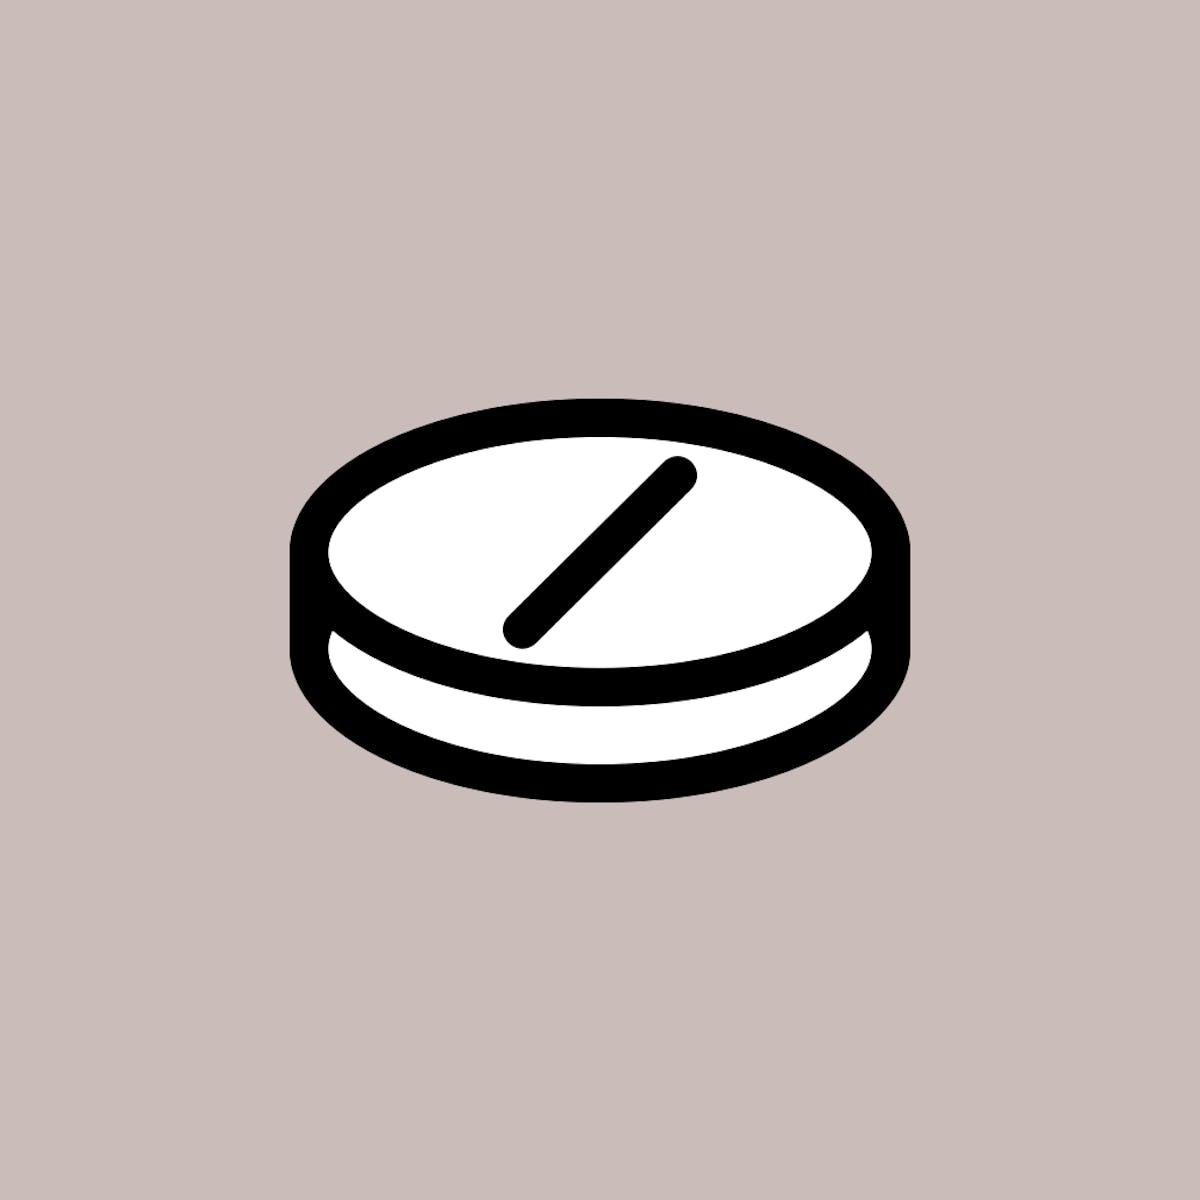 ciprofloxacin 0.3 ophthalmic solution price